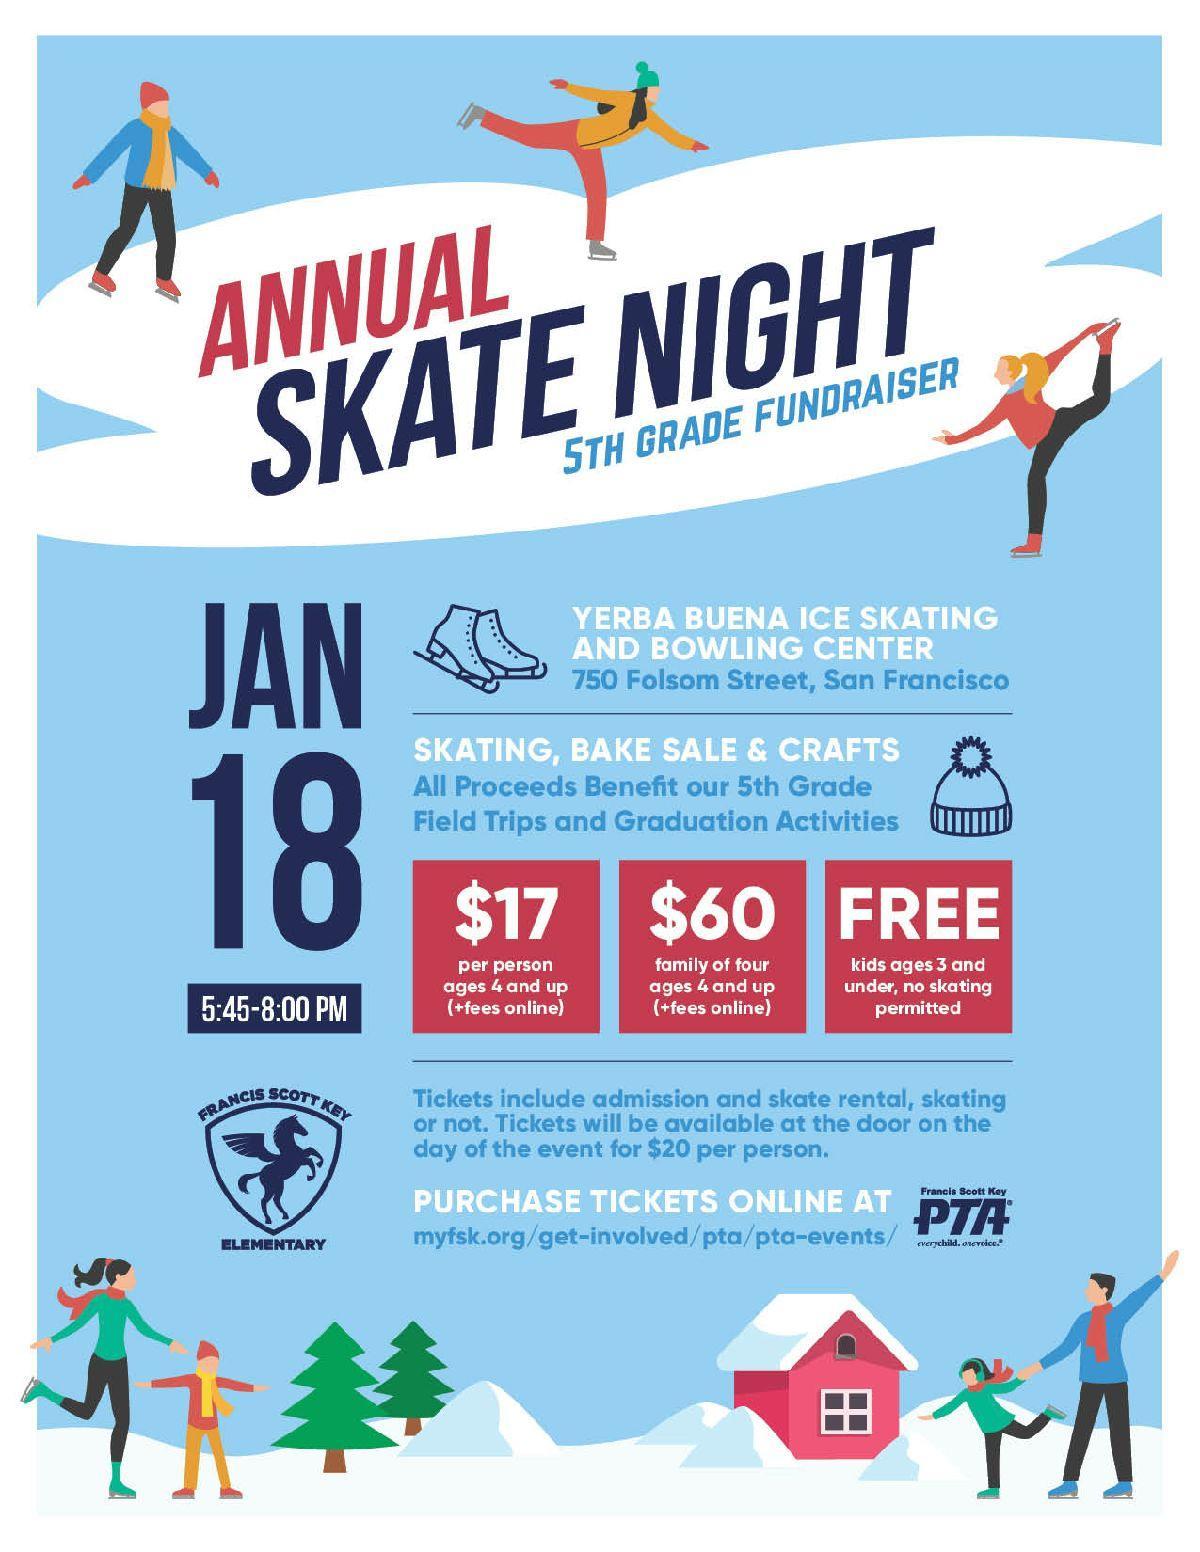 Annual Skate Night 5th Grade Fundraiser 2020